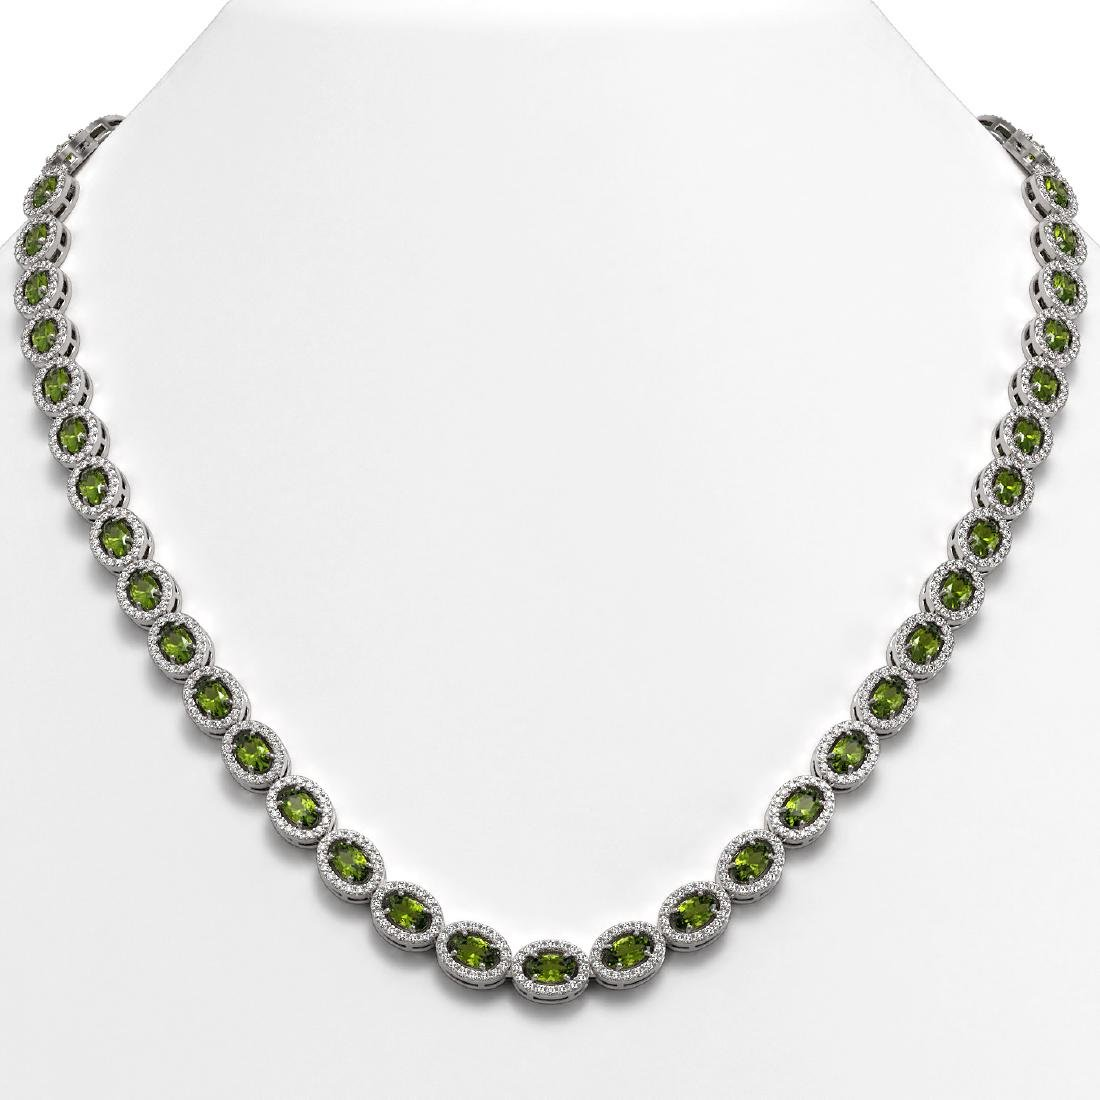 23.57 CTW Tourmaline & Diamond Halo Necklace 10K White